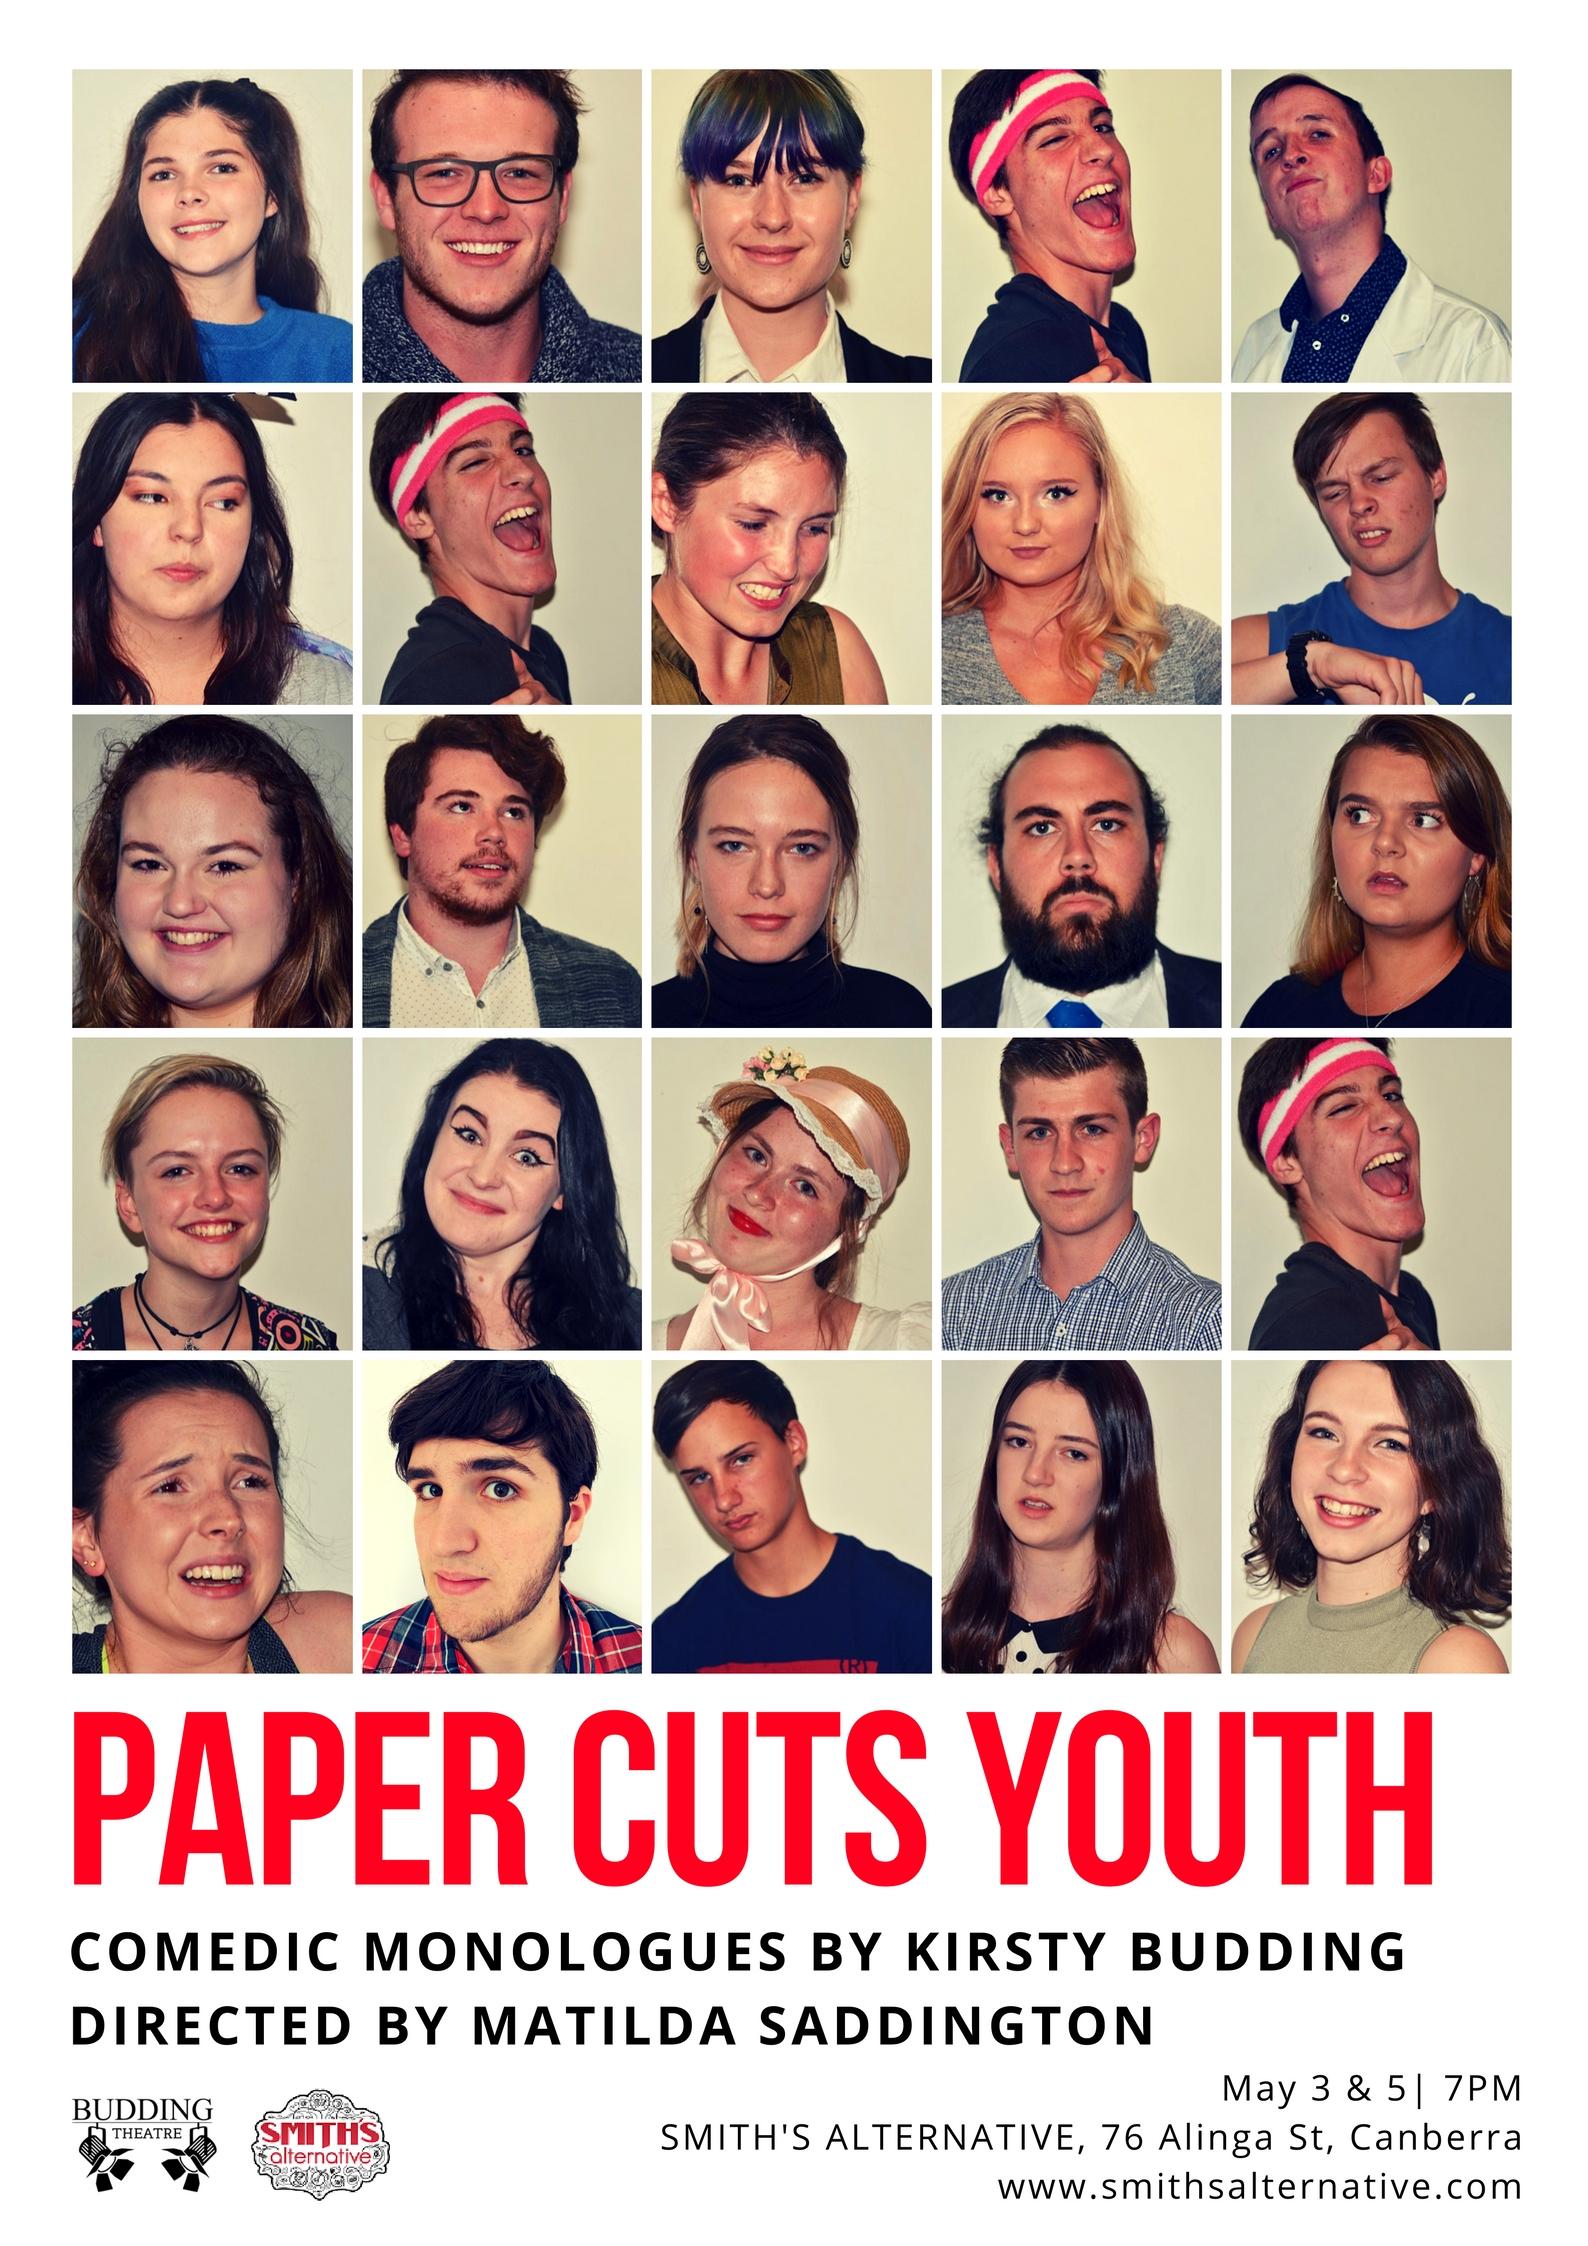 Paper Cuts Youth Kirsty Budding Matilda Saddington